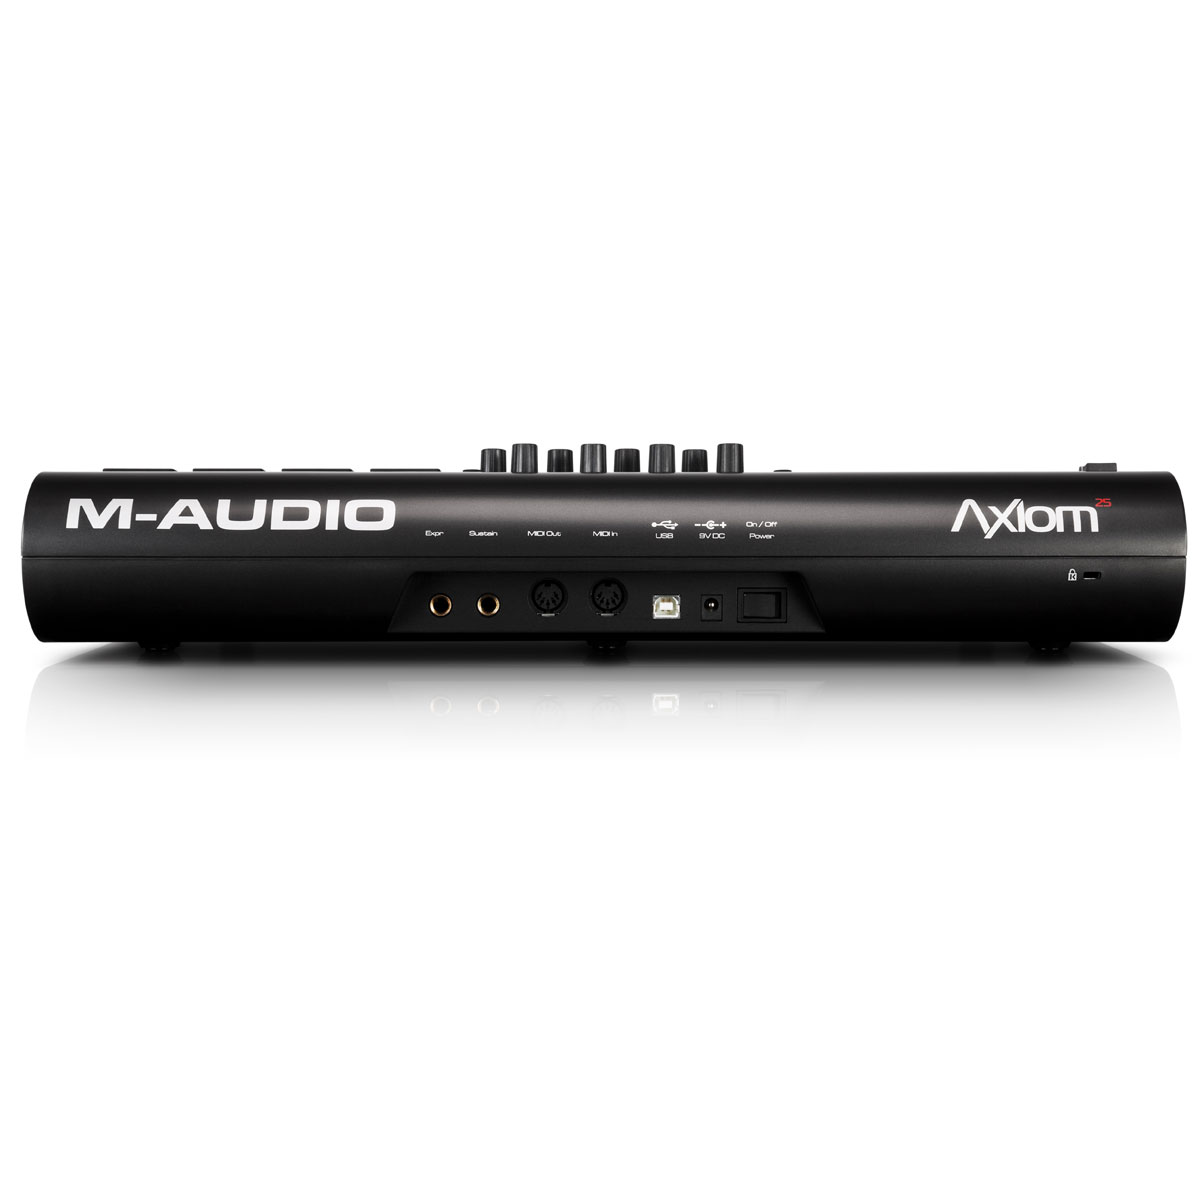 M-Audio Axiom AIR - Attack Magazine